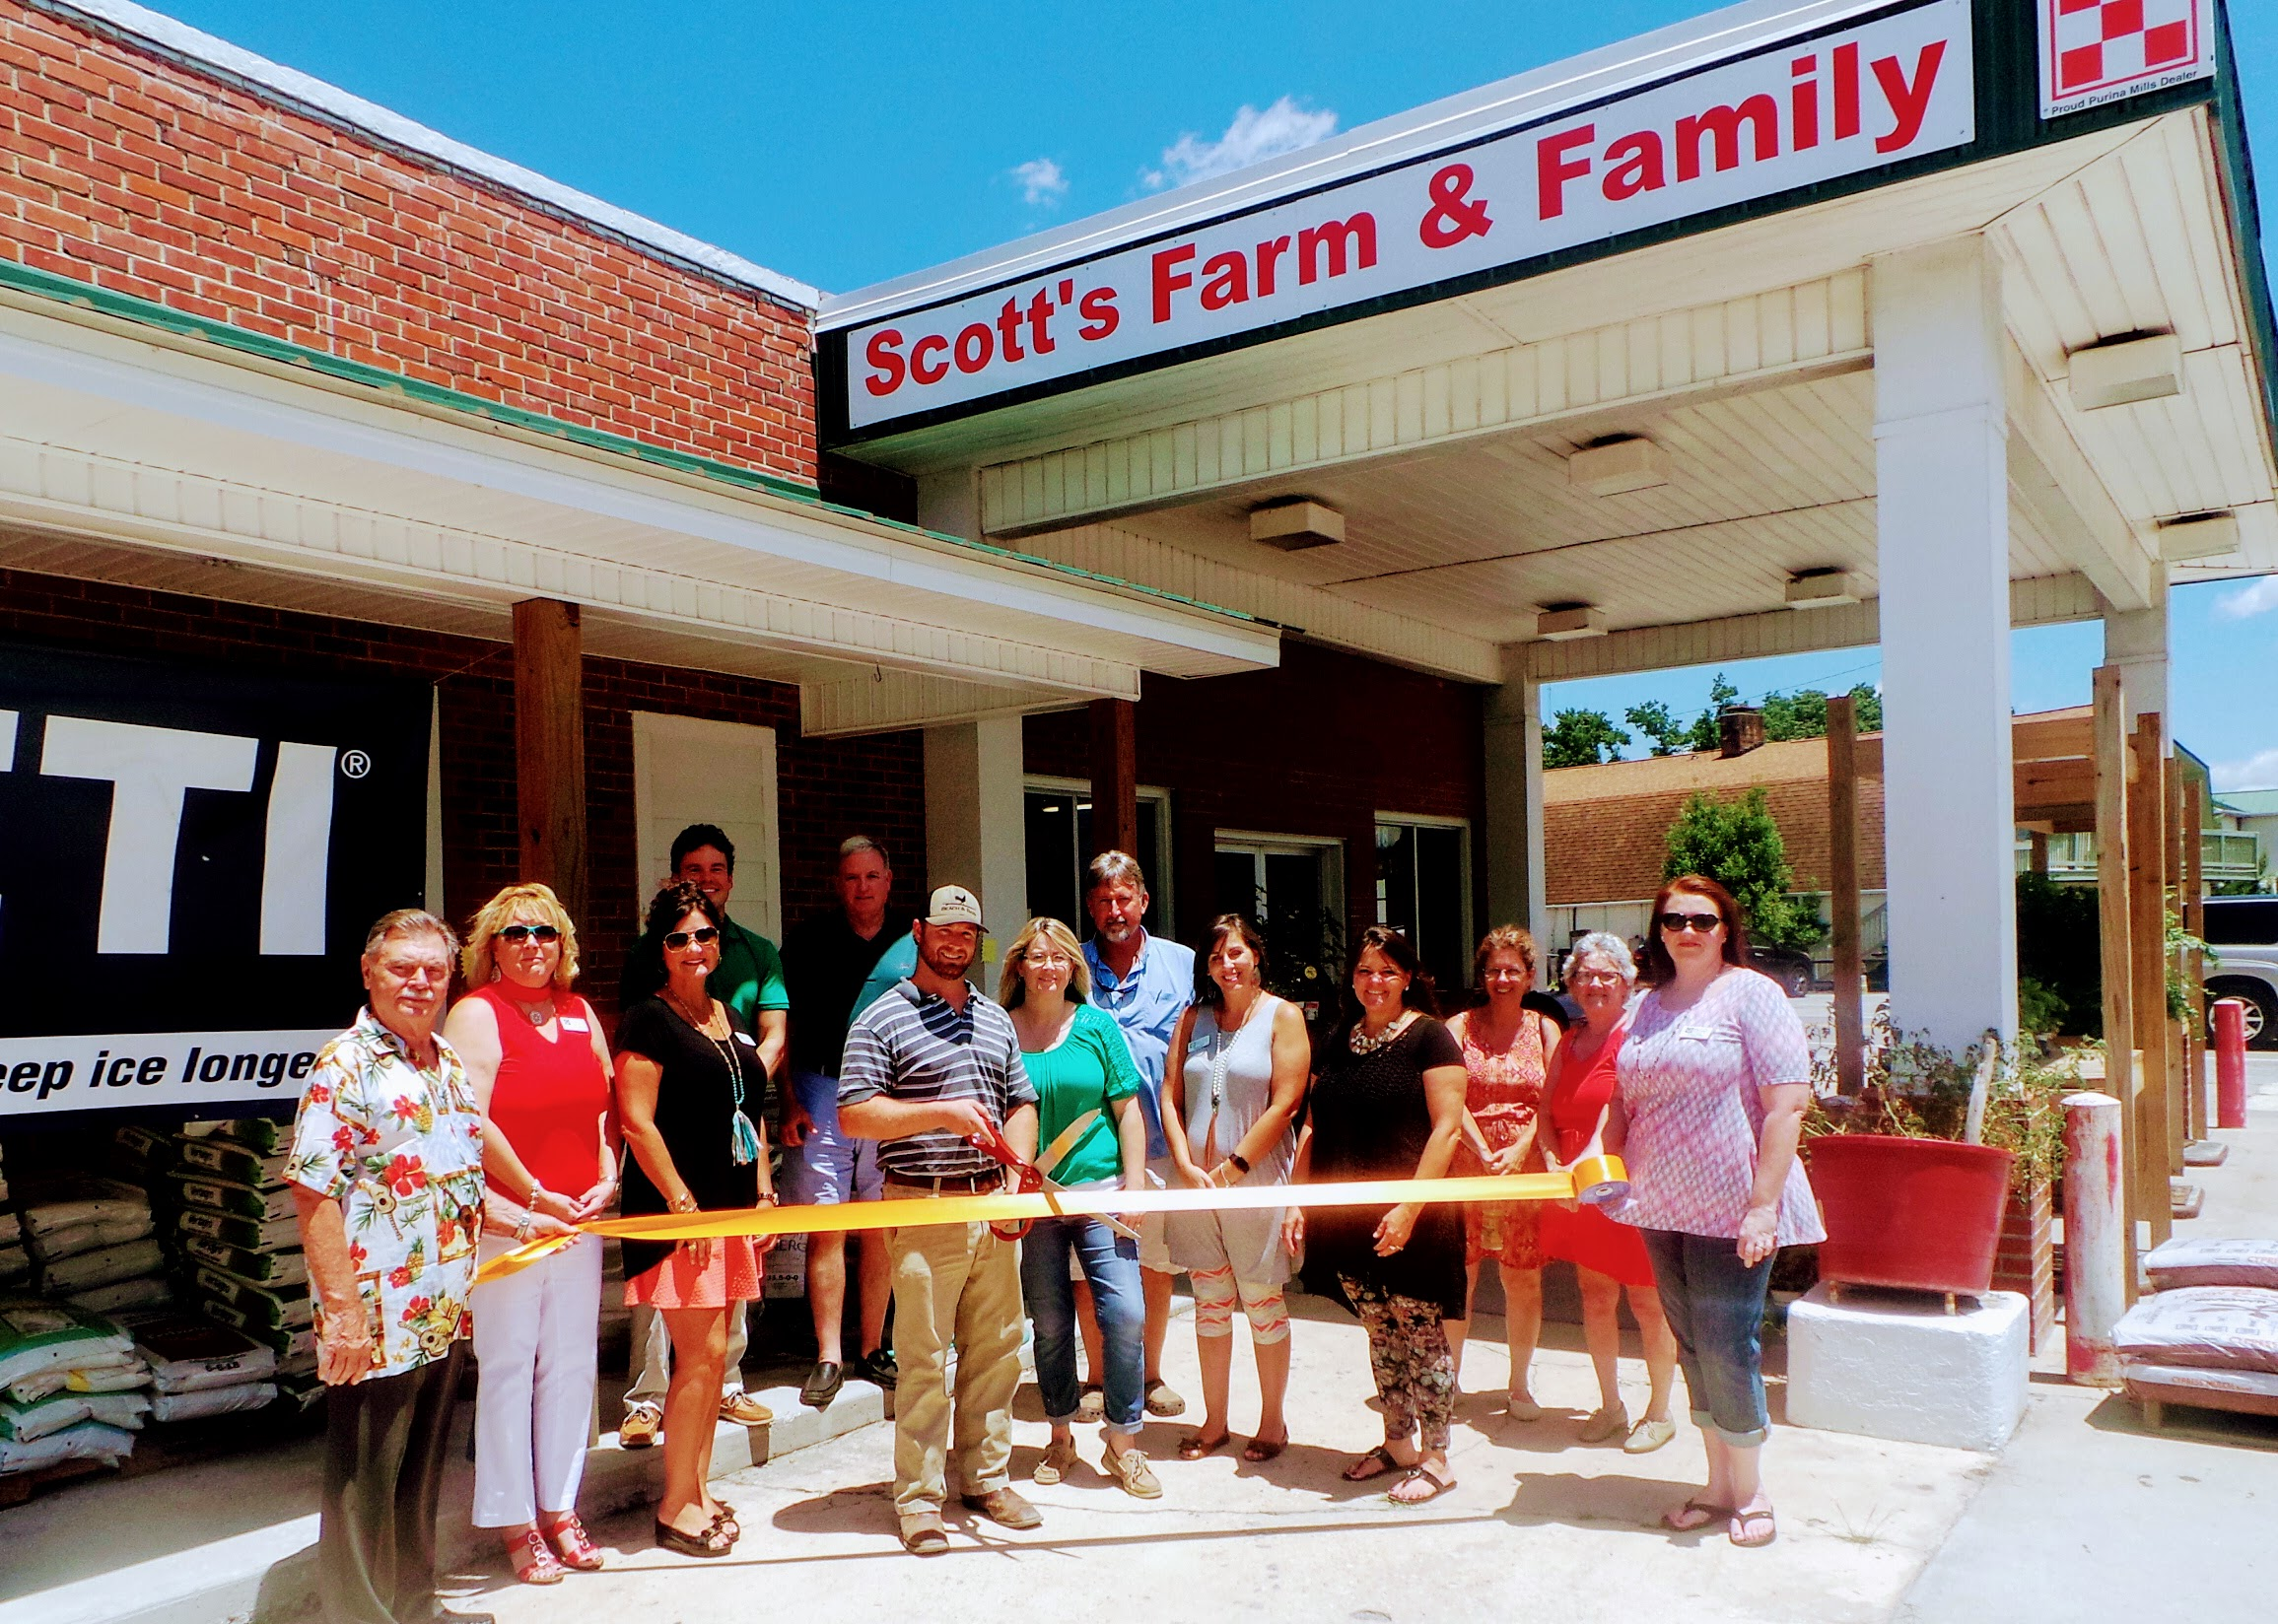 scott-farm-and-family.JPG